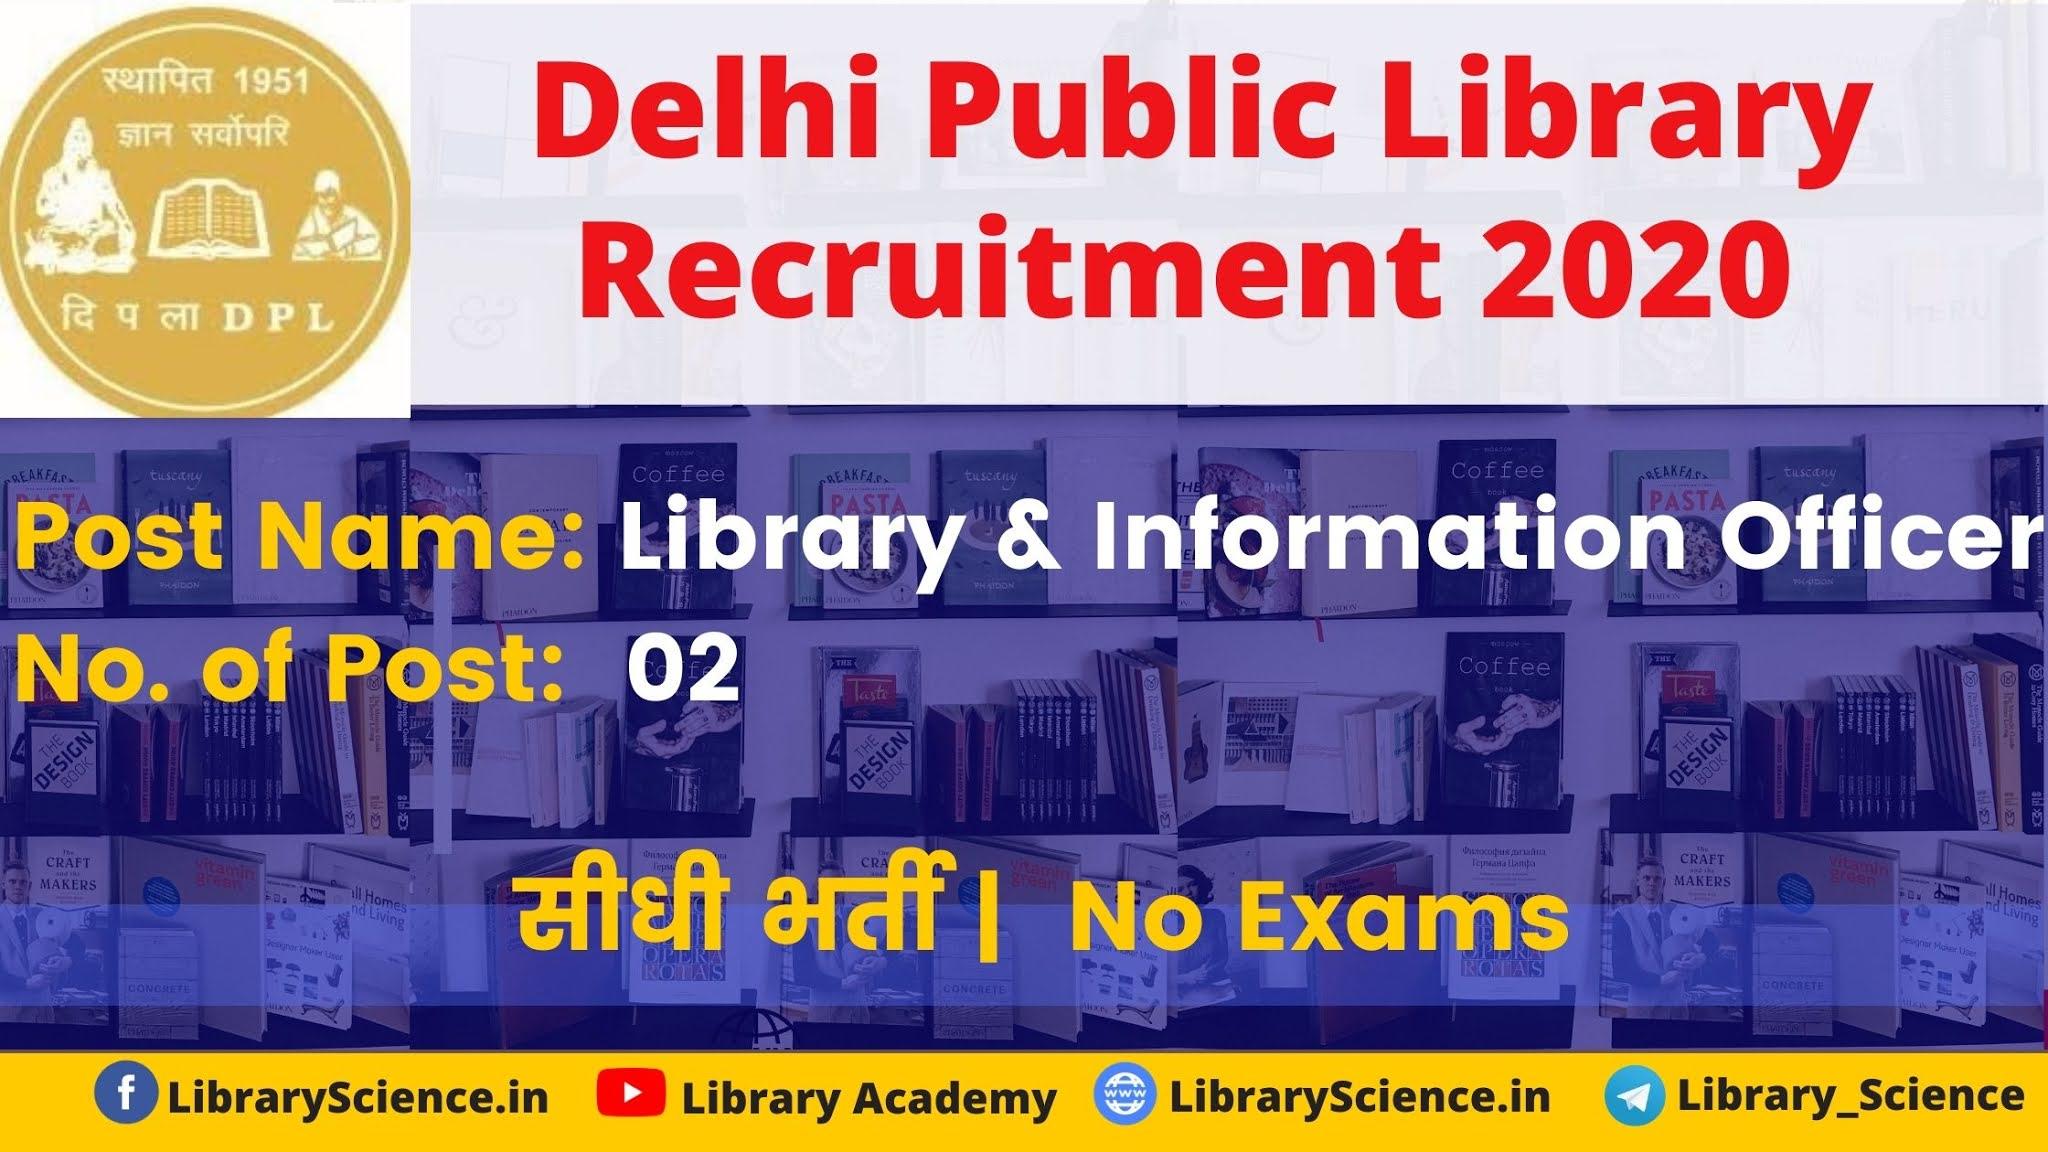 Library Vacancyy at Delhi Public Library